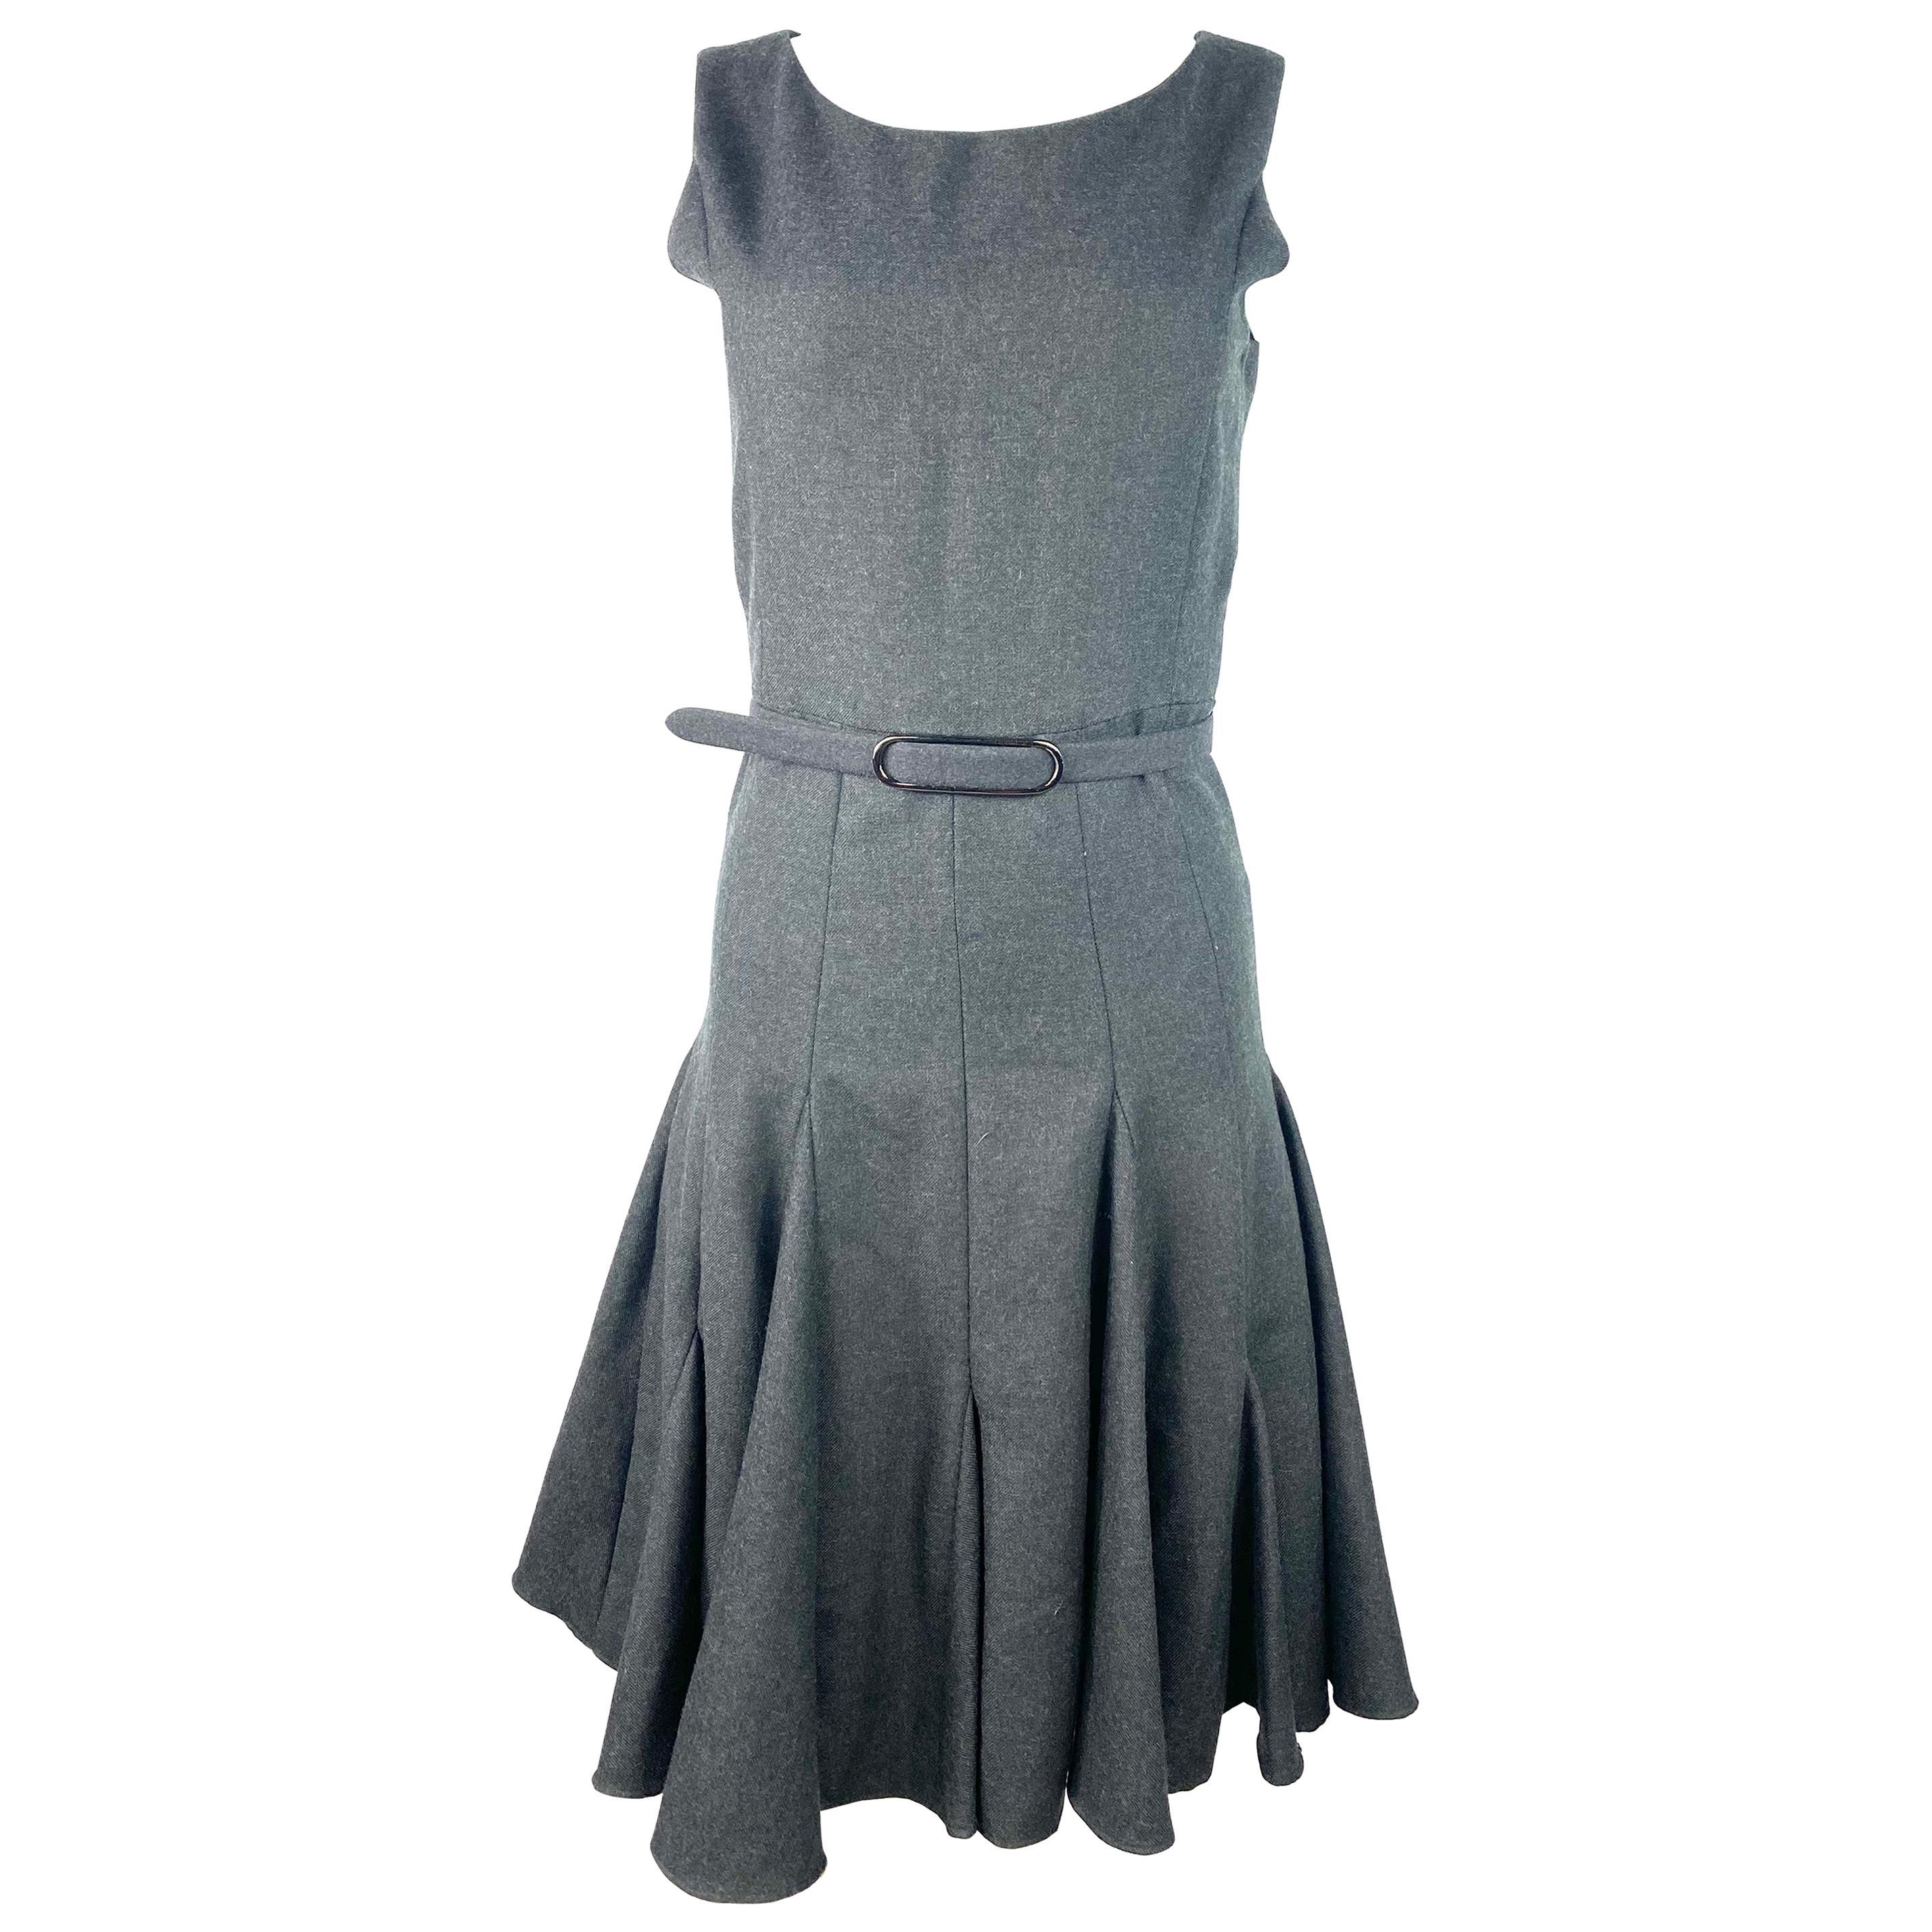 Runway Oscar De La Renta Grey Wool Sleeveless Dress, Size 2